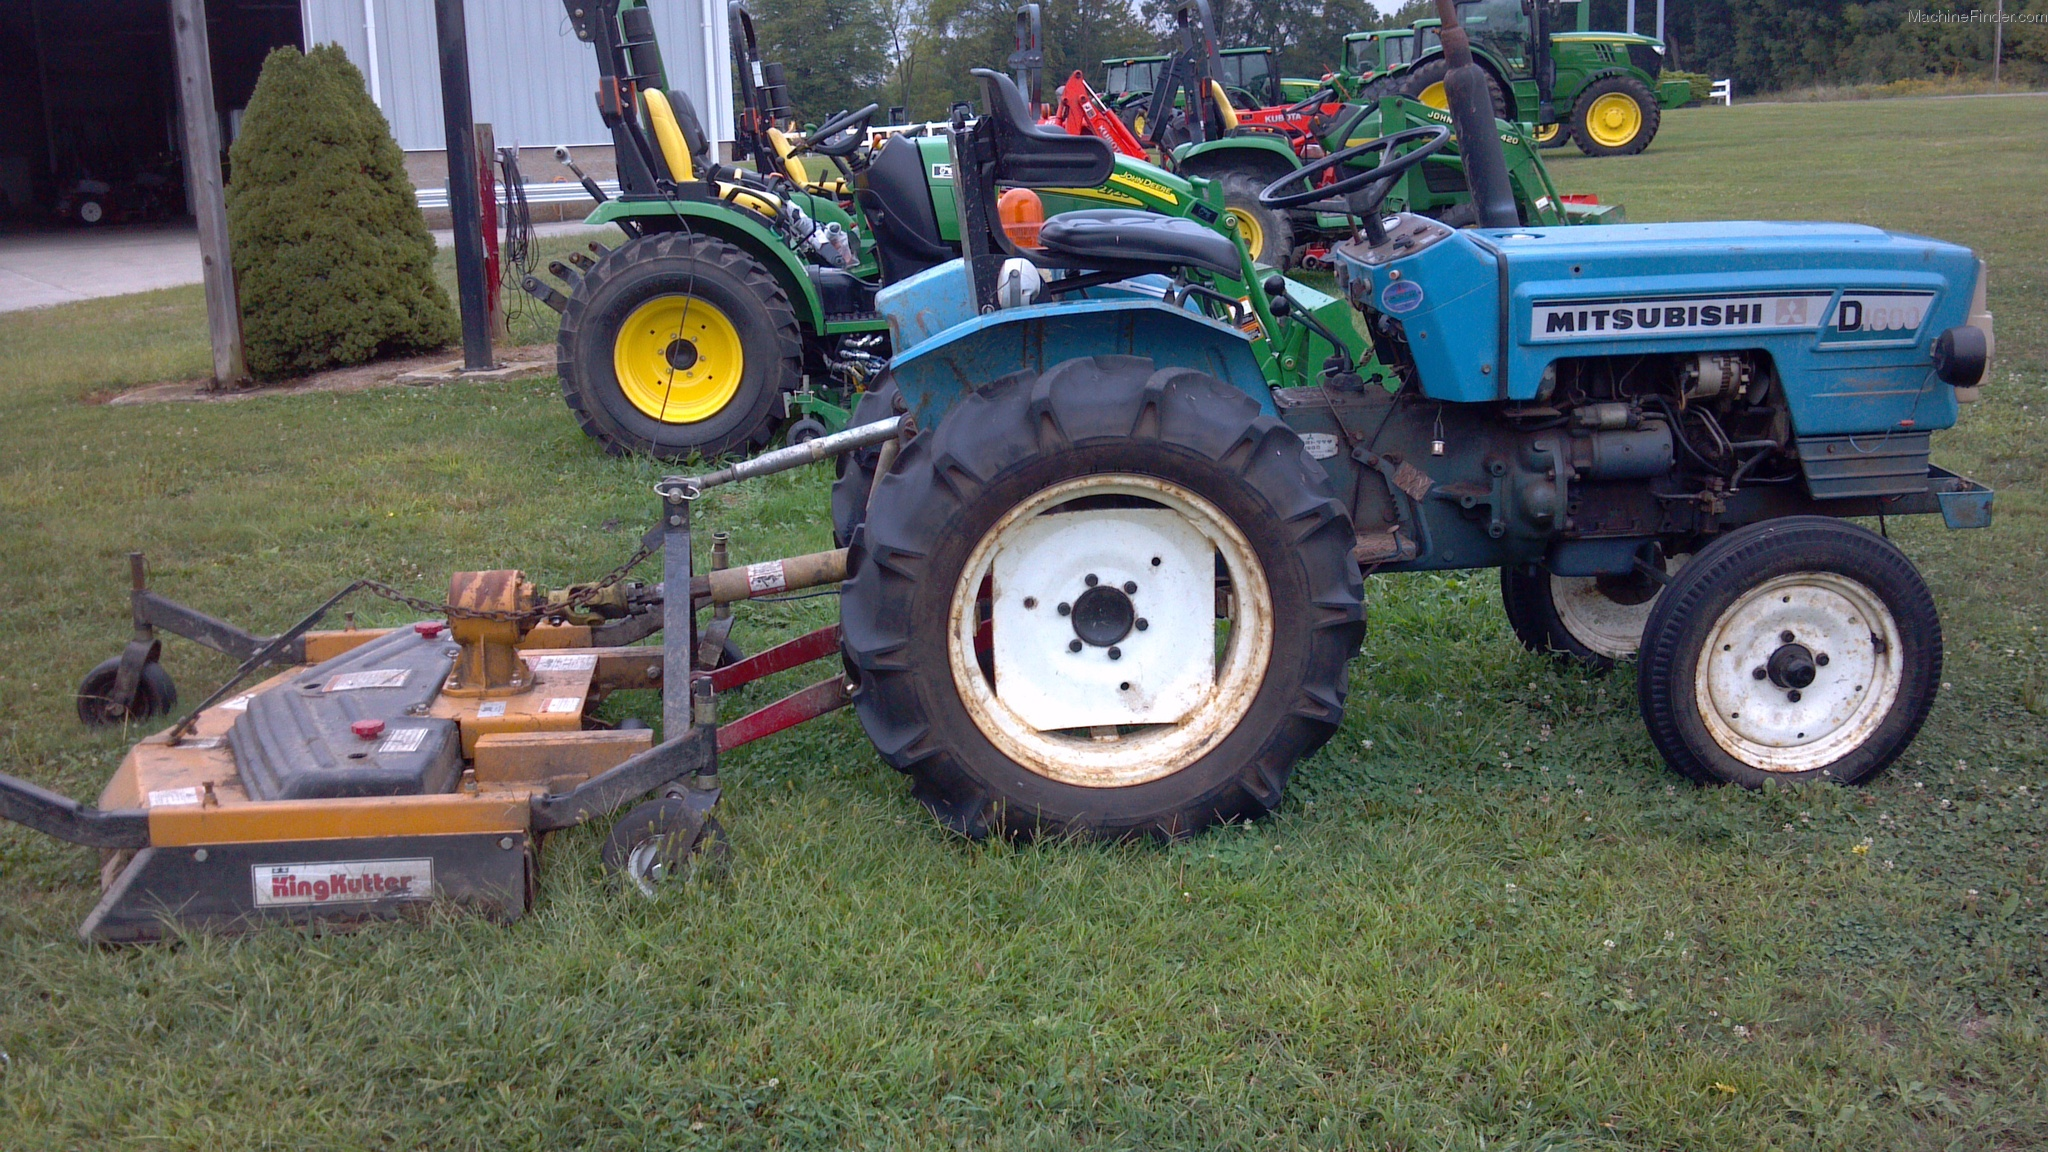 Mitsubishi Tractor Mt2201 Parts : Tweet